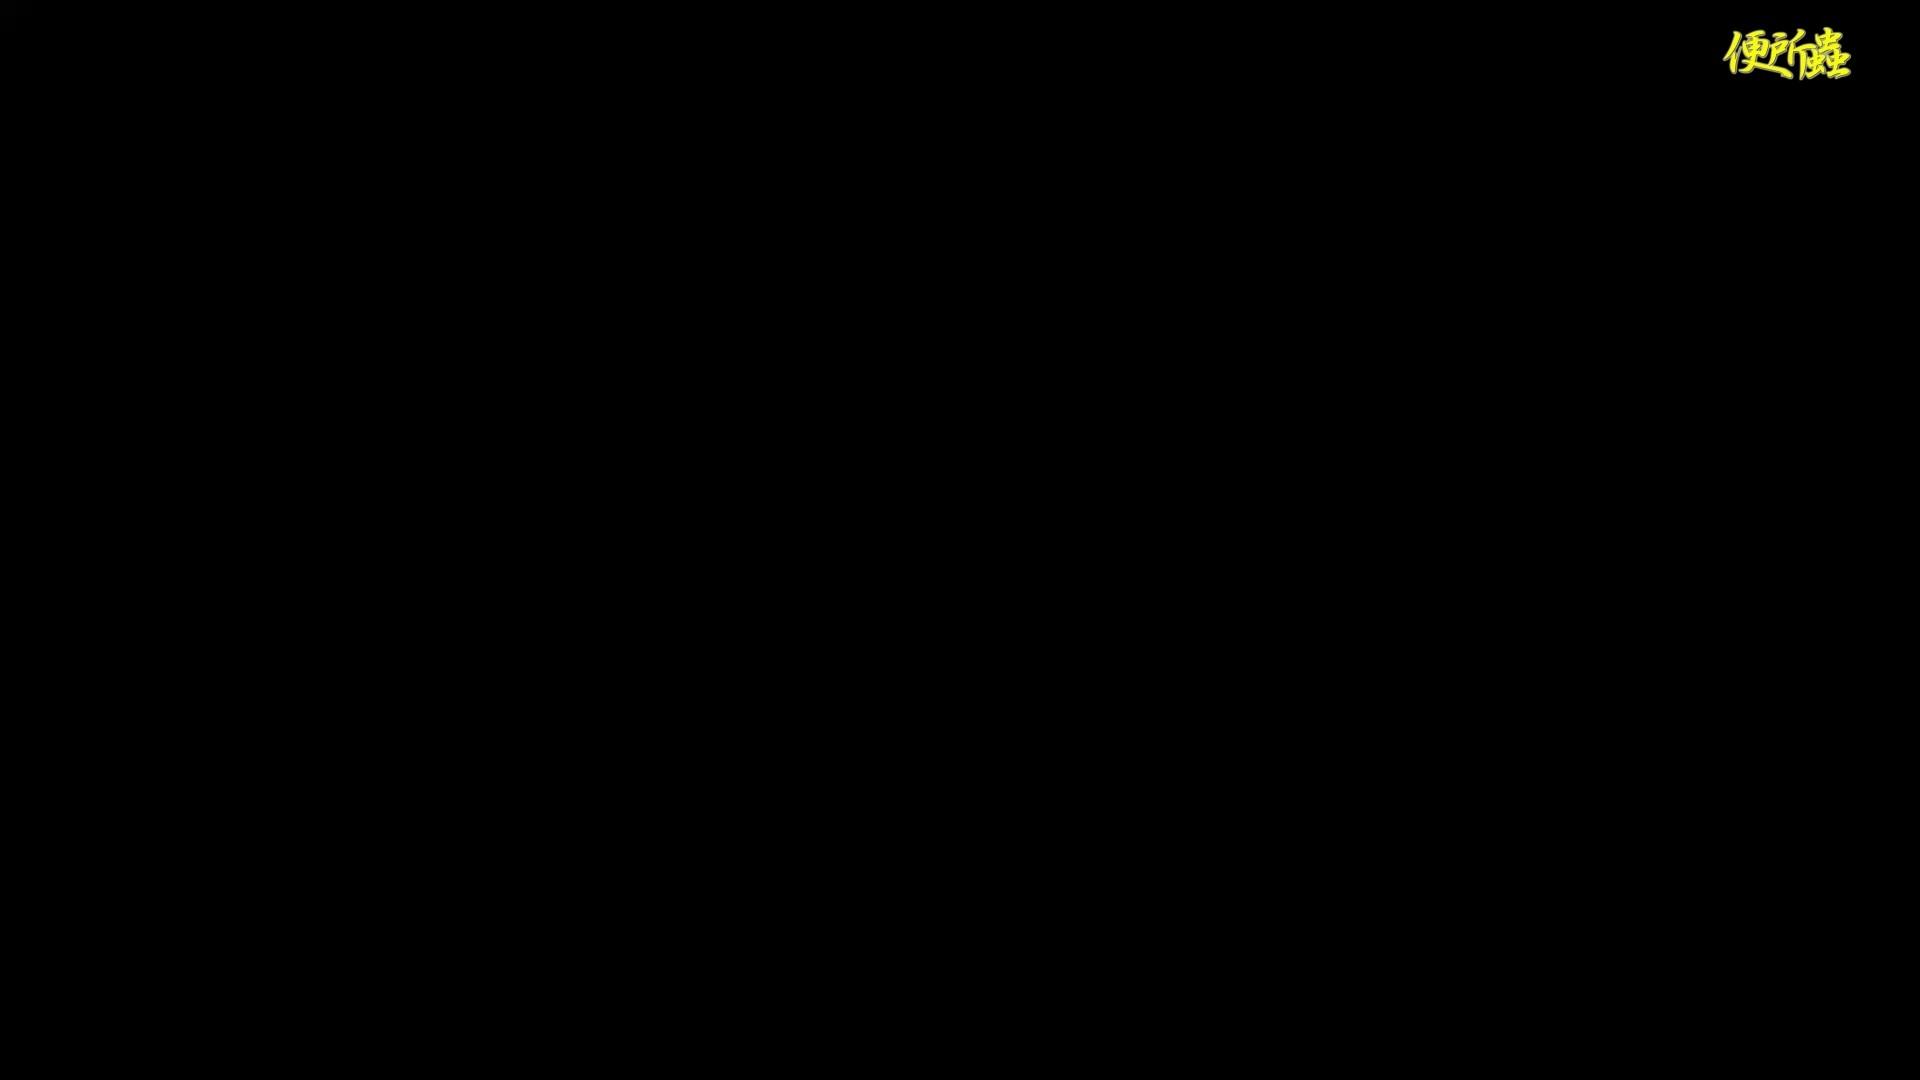 vol.07 便所蟲さんのリターン~寺子屋洗面所盗撮~※画質改善※総勢7名 ガールの盗撮 えろ無修正画像 64枚